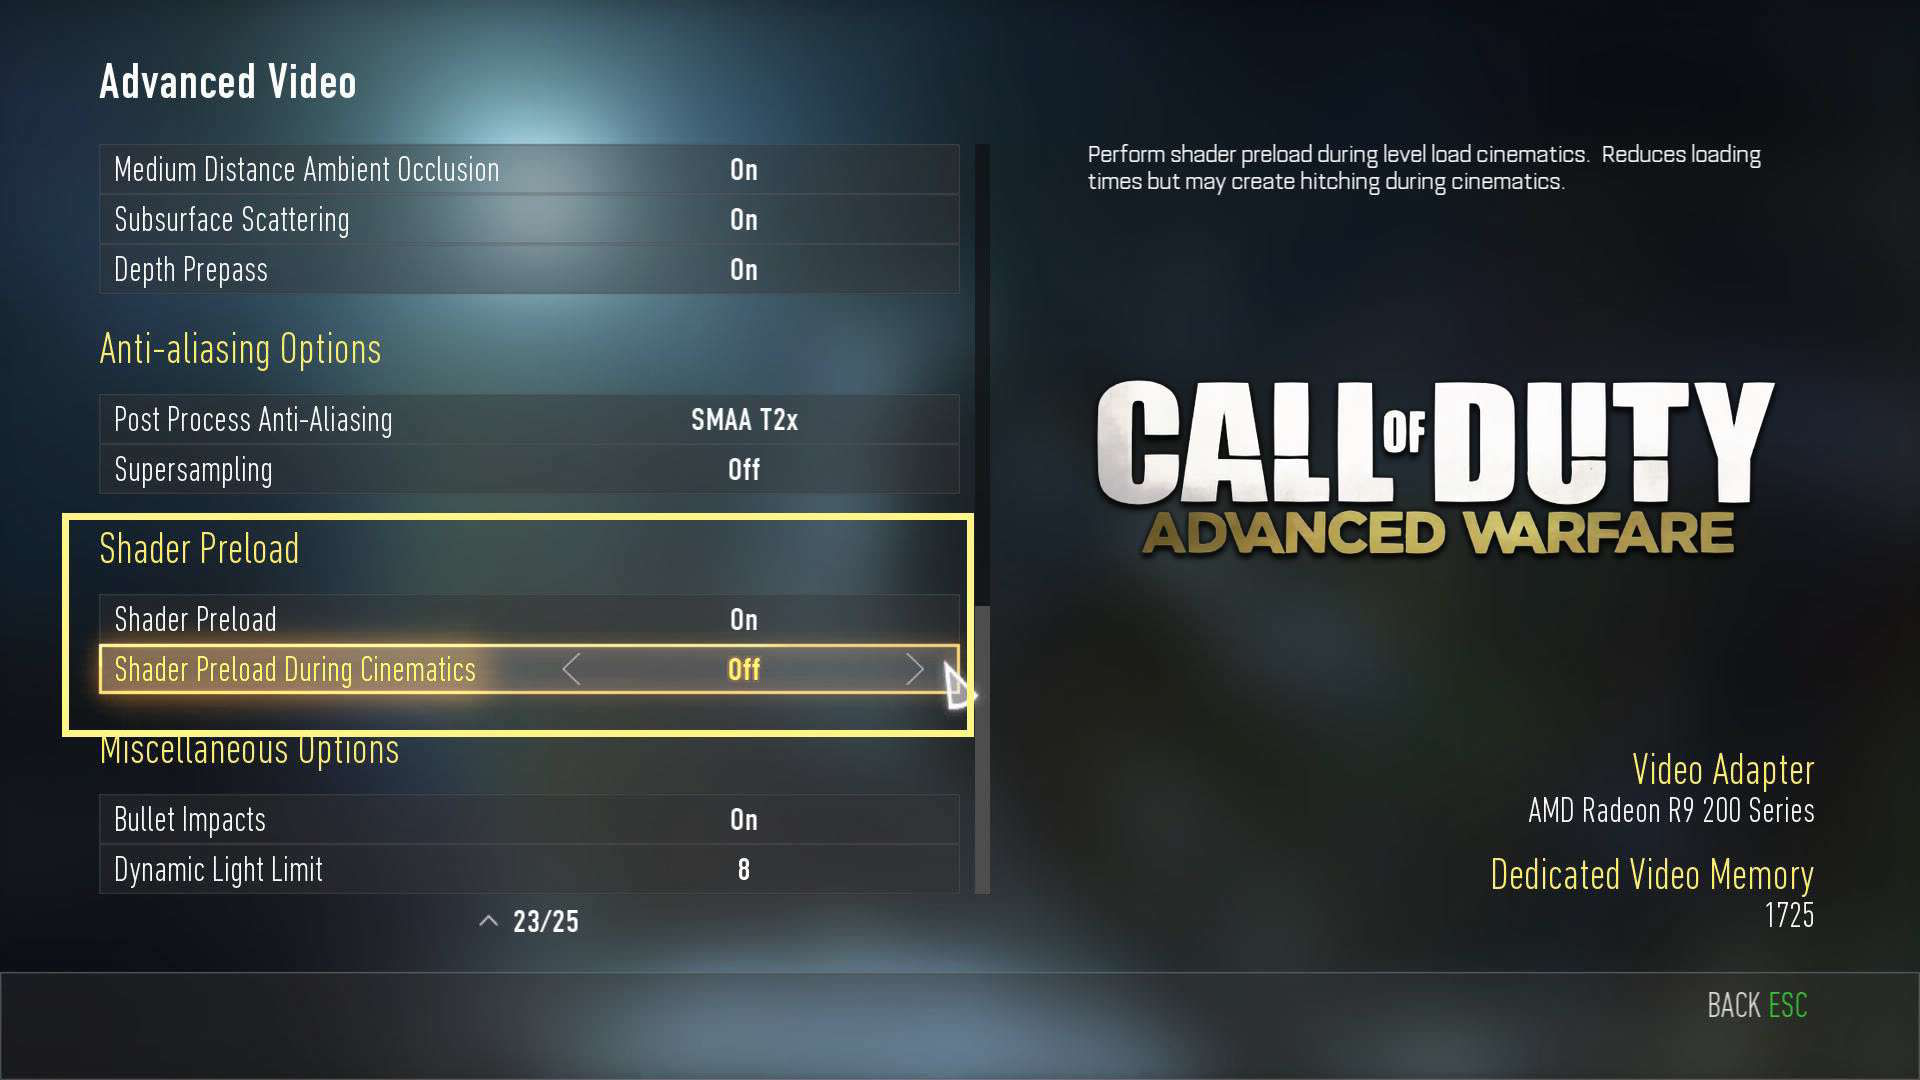 Call of Duty Advanced Warfare Advanced Video Ayarları Shader